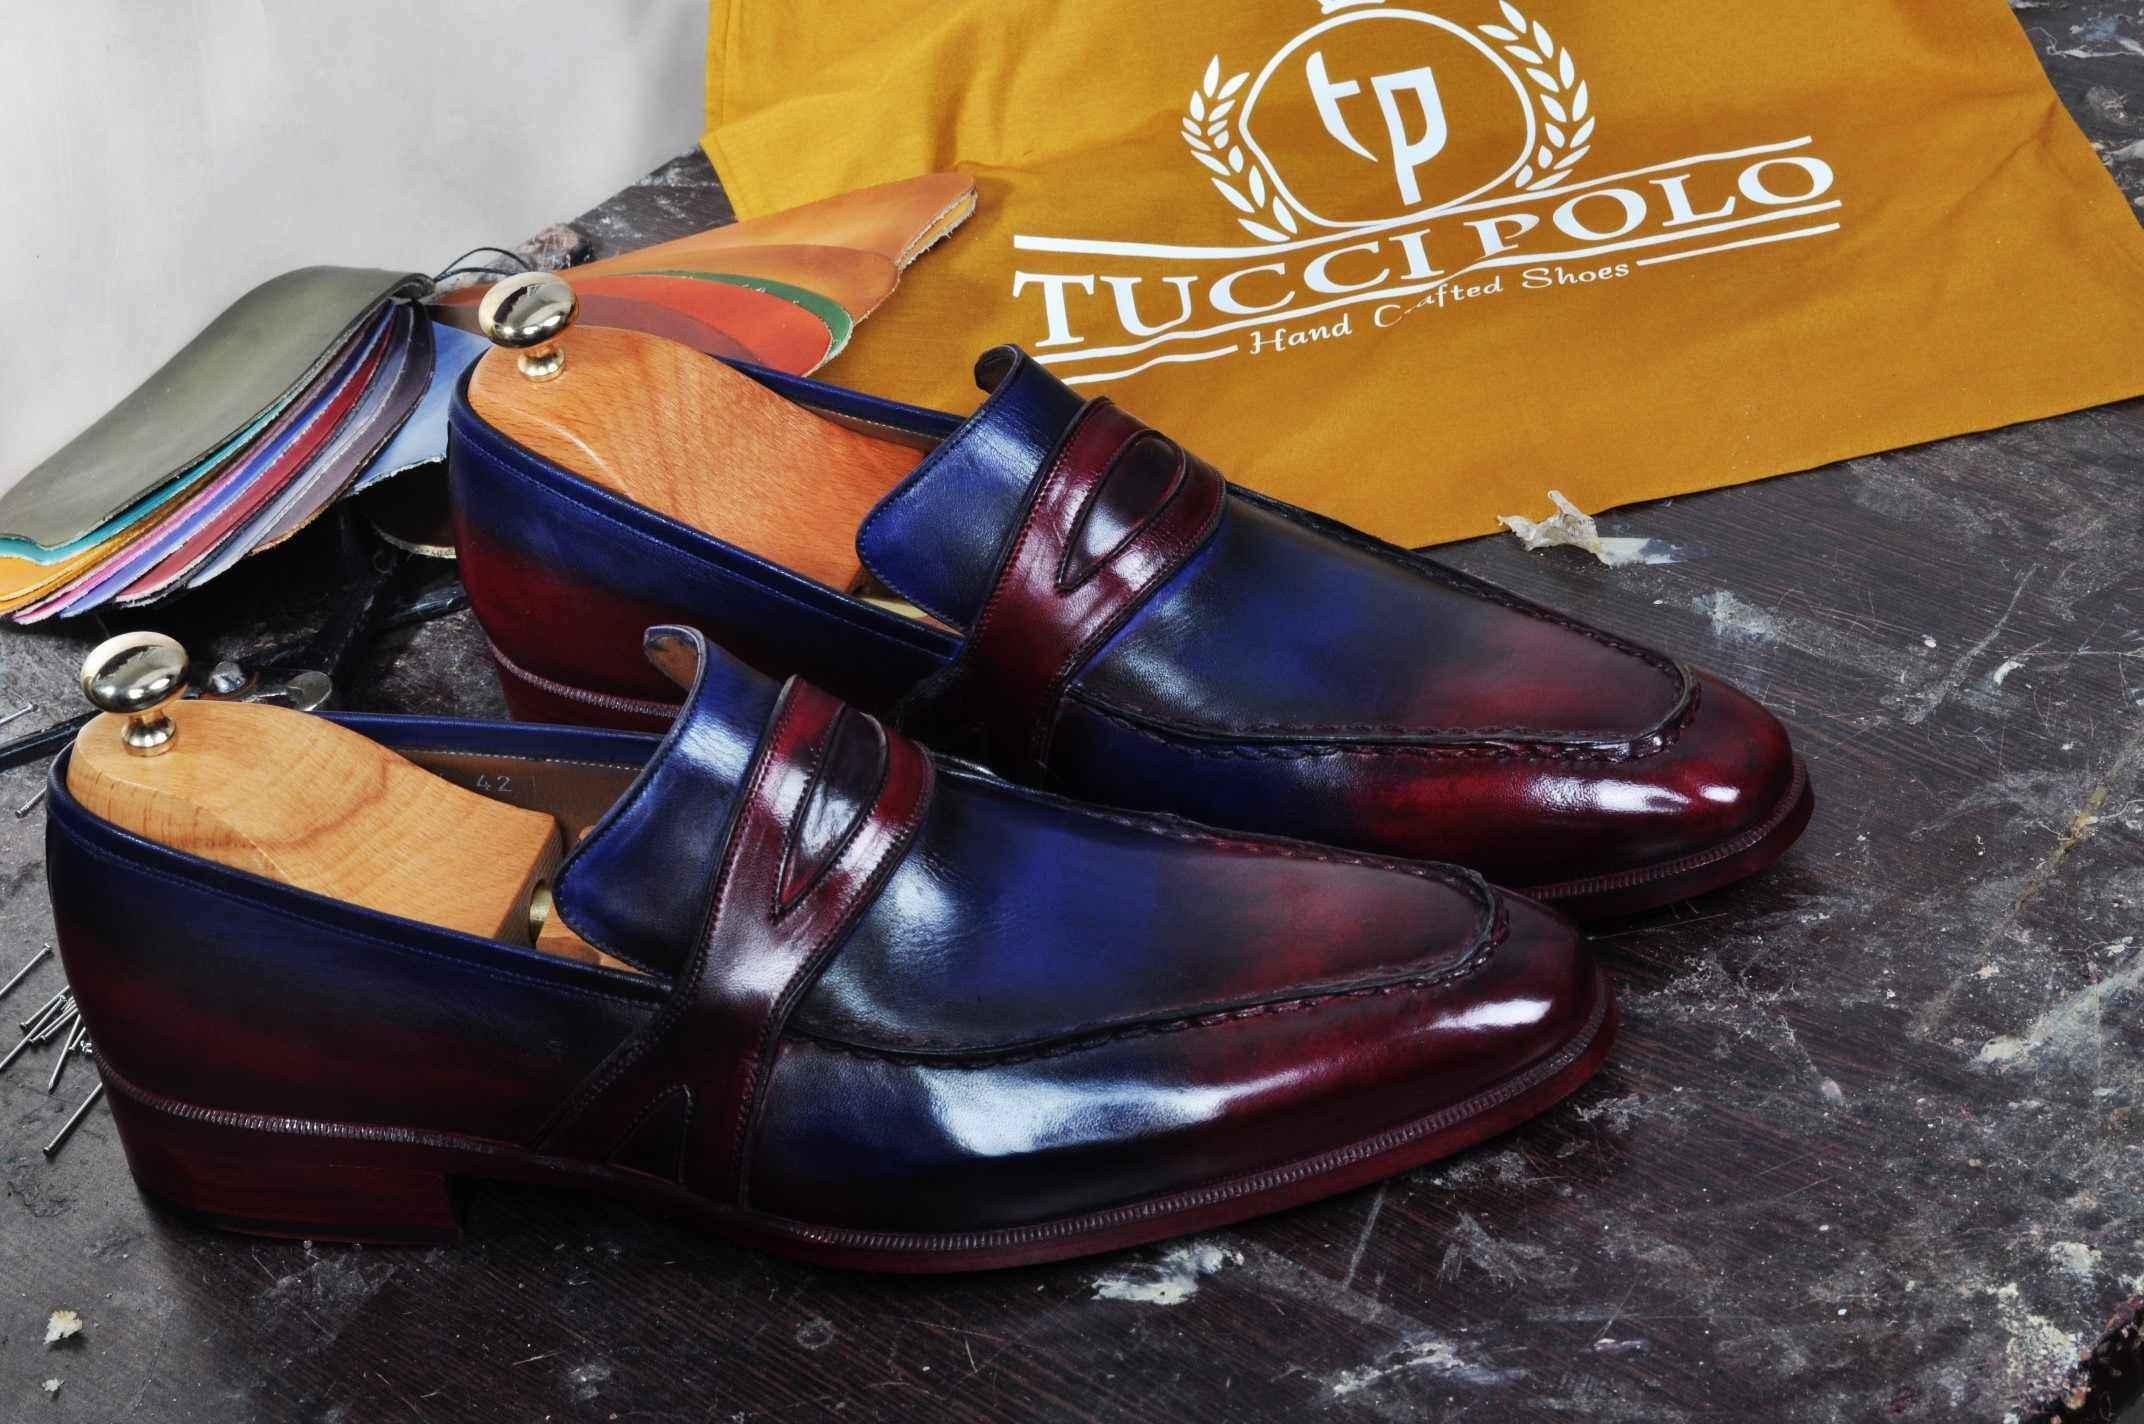 2584cc70babdb TucciPolo Mens Handmade Italian Leather Luxury Two Tone Blueish ...